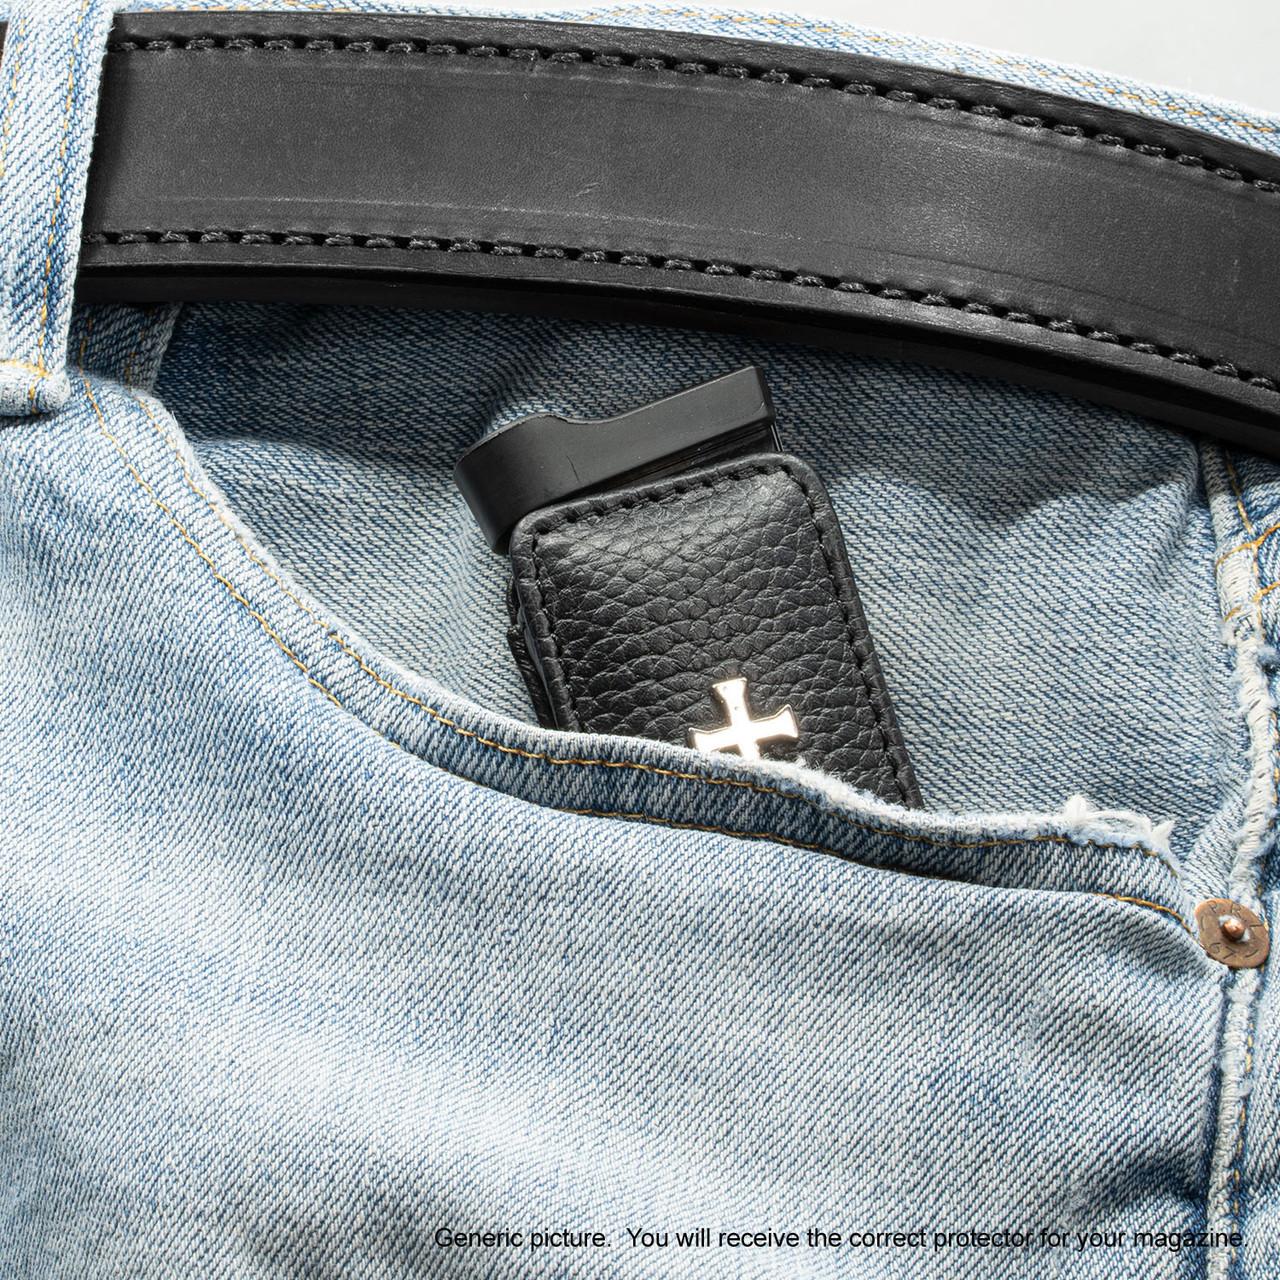 Glock 43 Black Leather Cross Magazine Pocket Protector